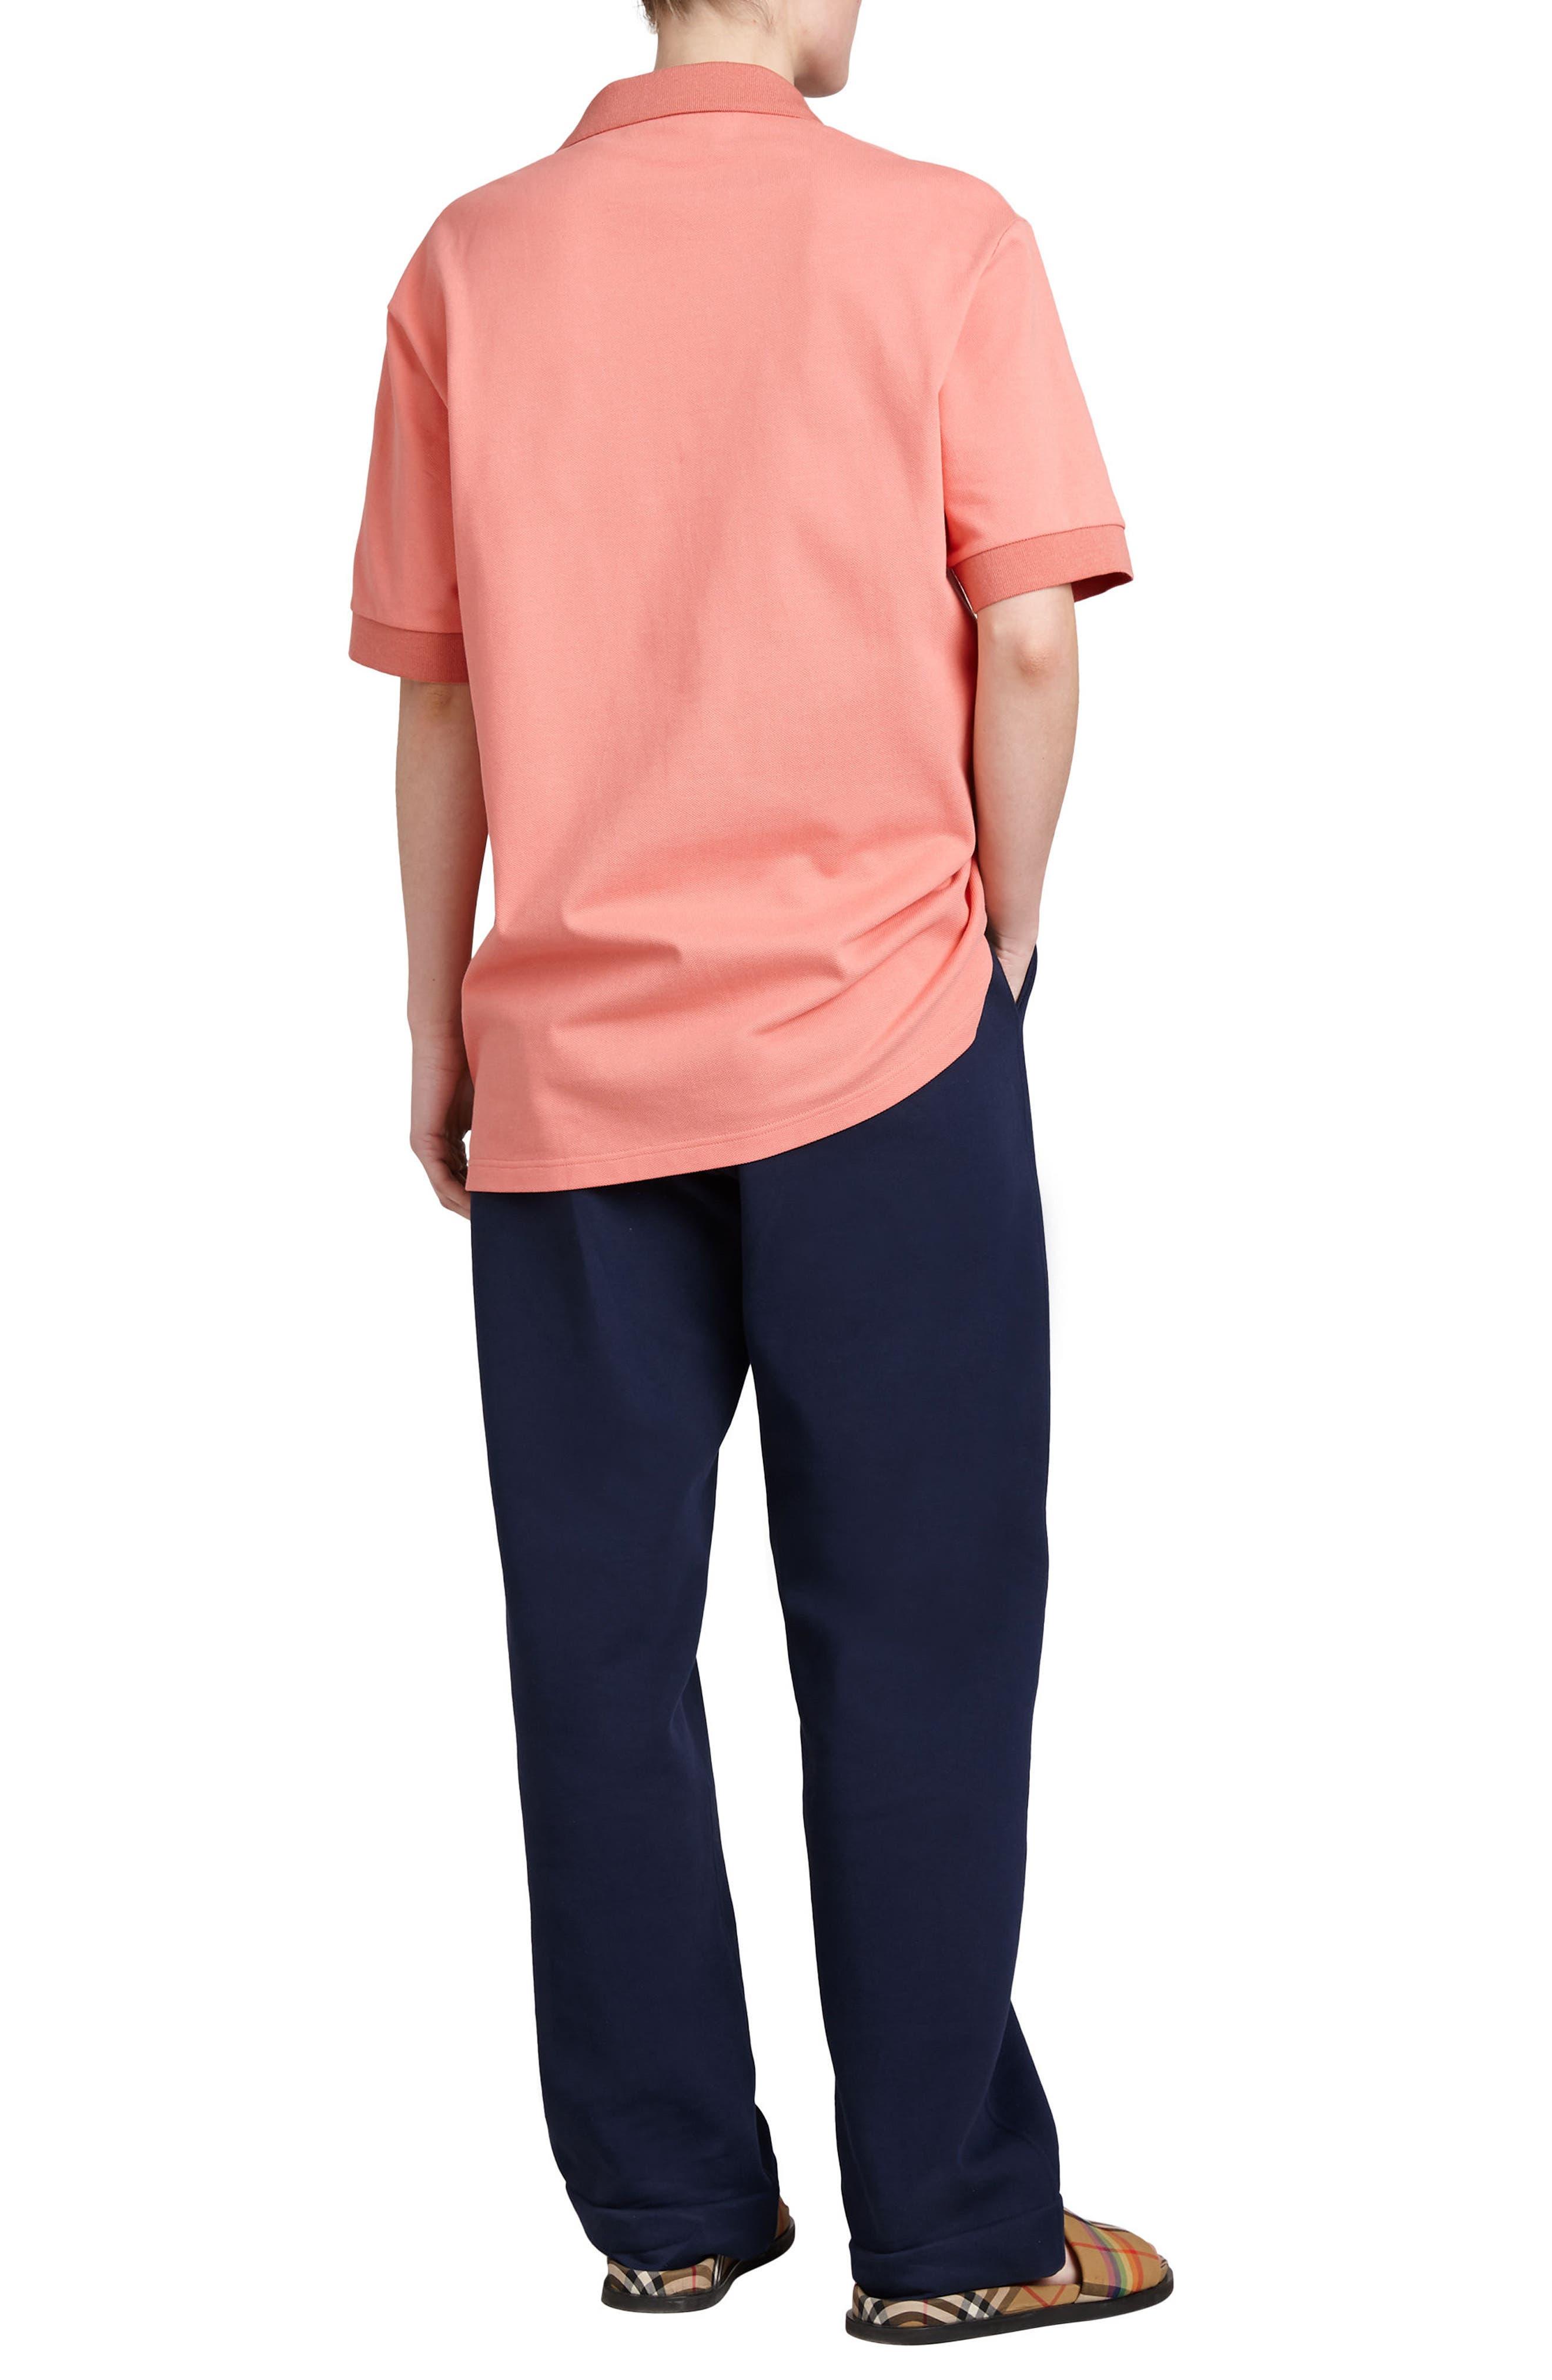 Vintage Crest Sweatpants,                             Alternate thumbnail 6, color,                             MIDNIGHT BLUE